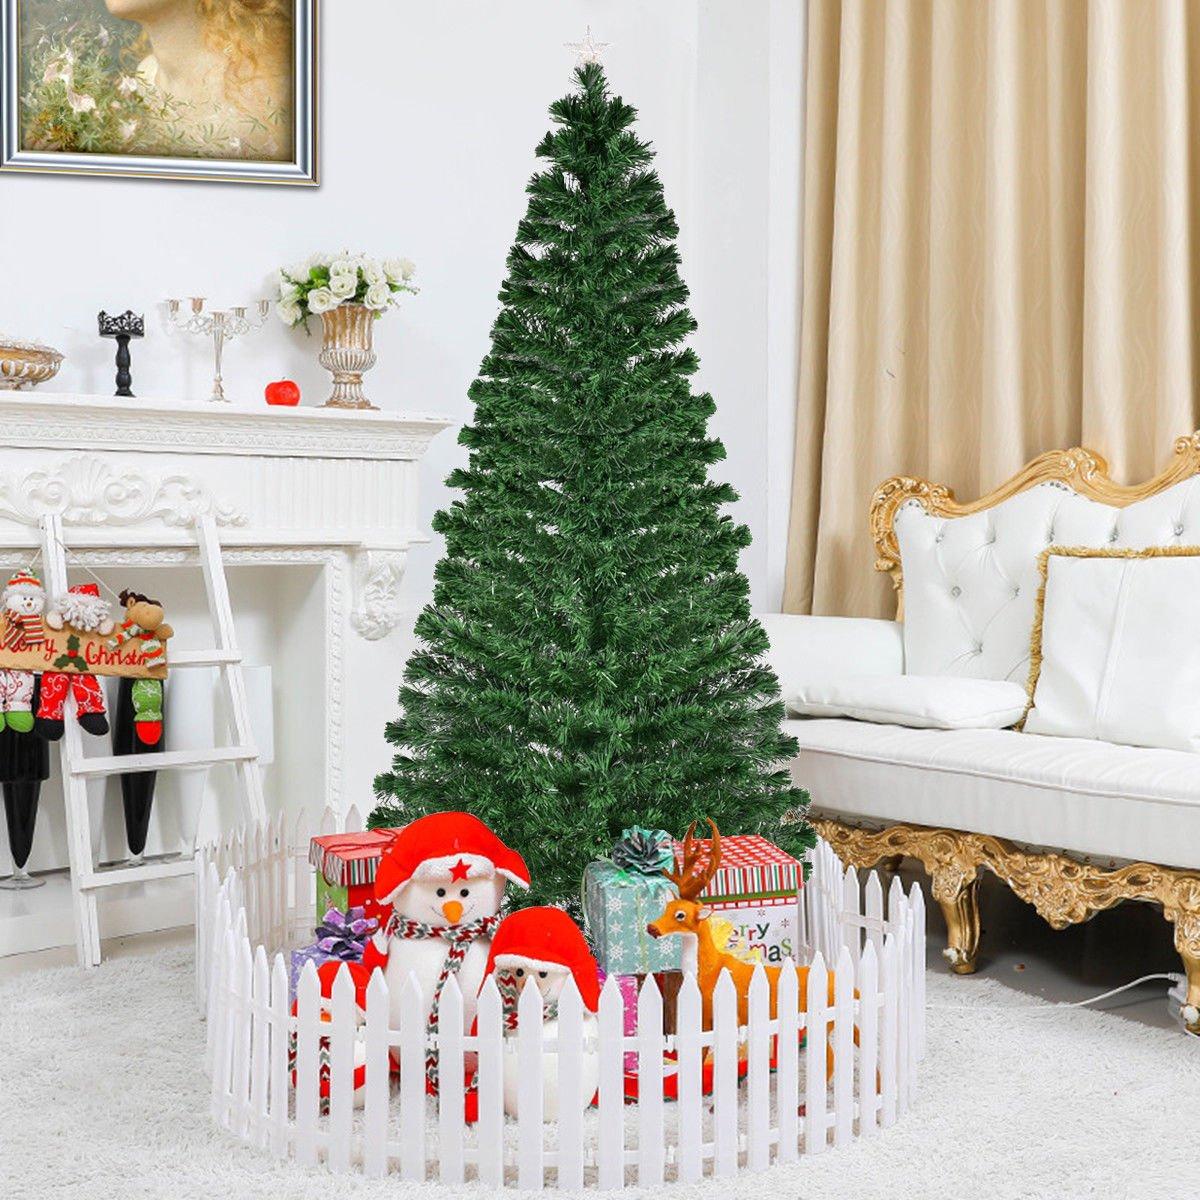 Amazon.com: Goplus 7FT Pre-Lit Artificial Christmas Tree Optical ...